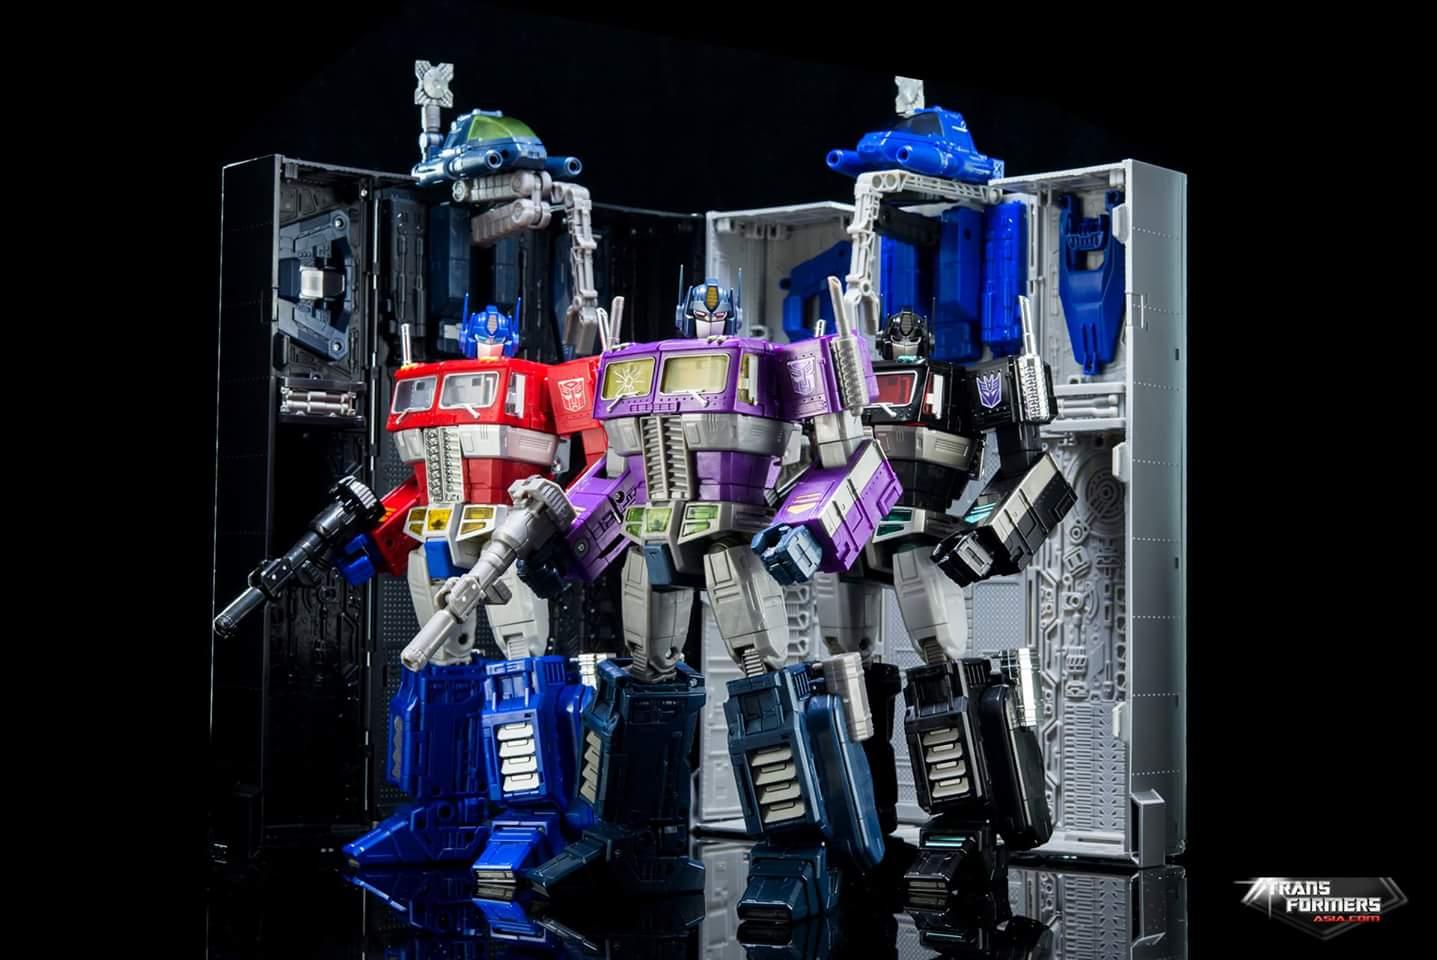 [Masterpiece] MP-10B | MP-10A | MP-10R | MP-10SG | MP-10K | MP-711 | MP-10G | MP-10 ASL ― Convoy (Optimus Prime/Optimus Primus) - Page 4 ULUrJnTB